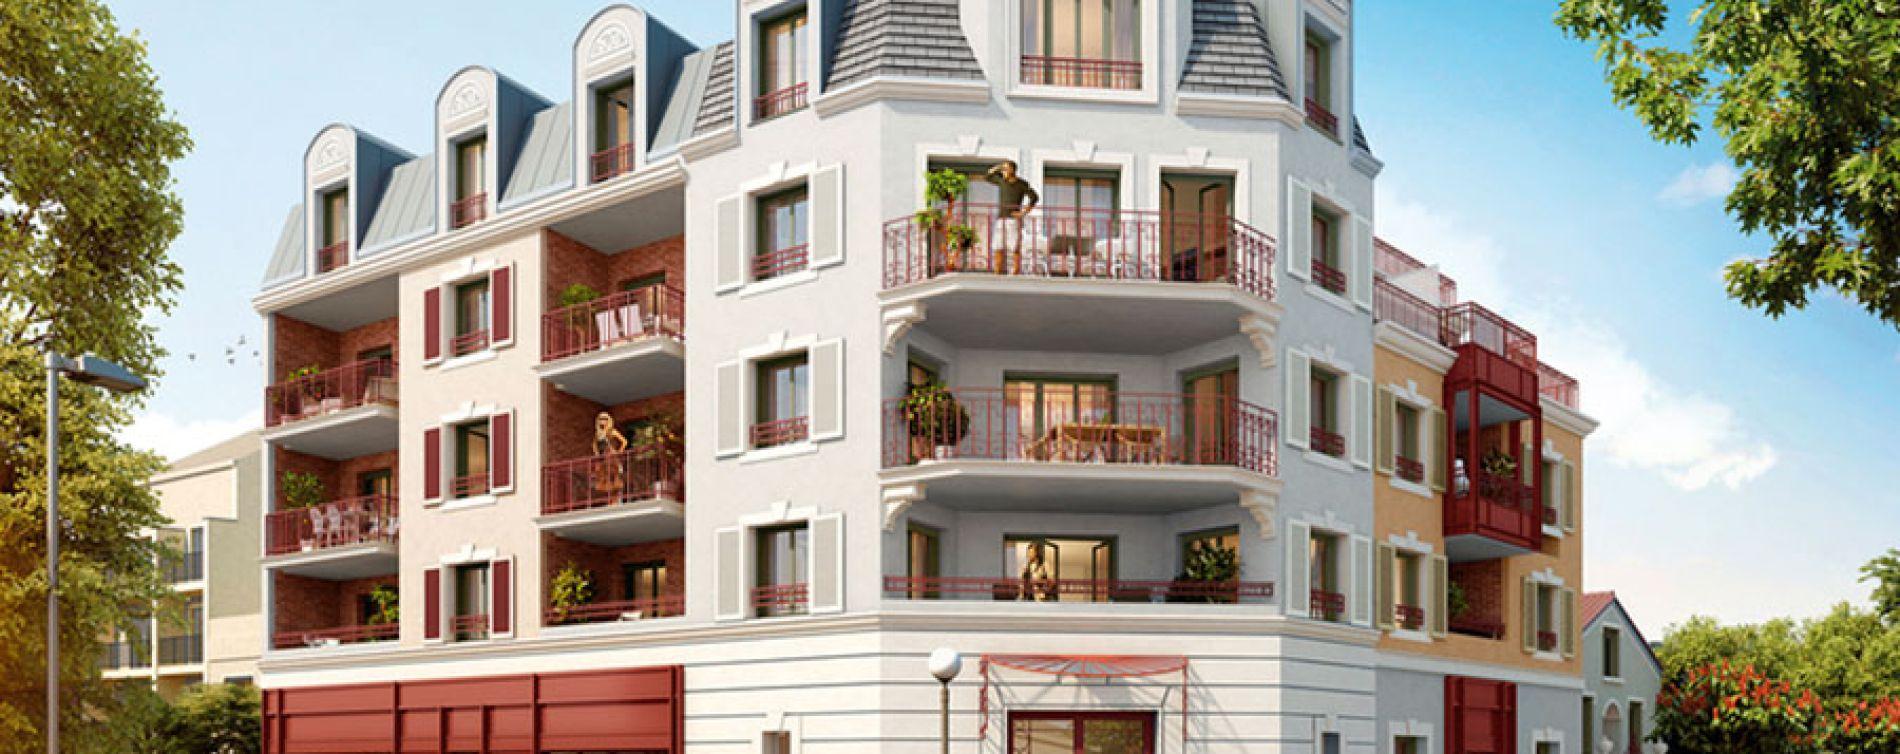 Résidence Villa Paladilhe au Blanc-Mesnil